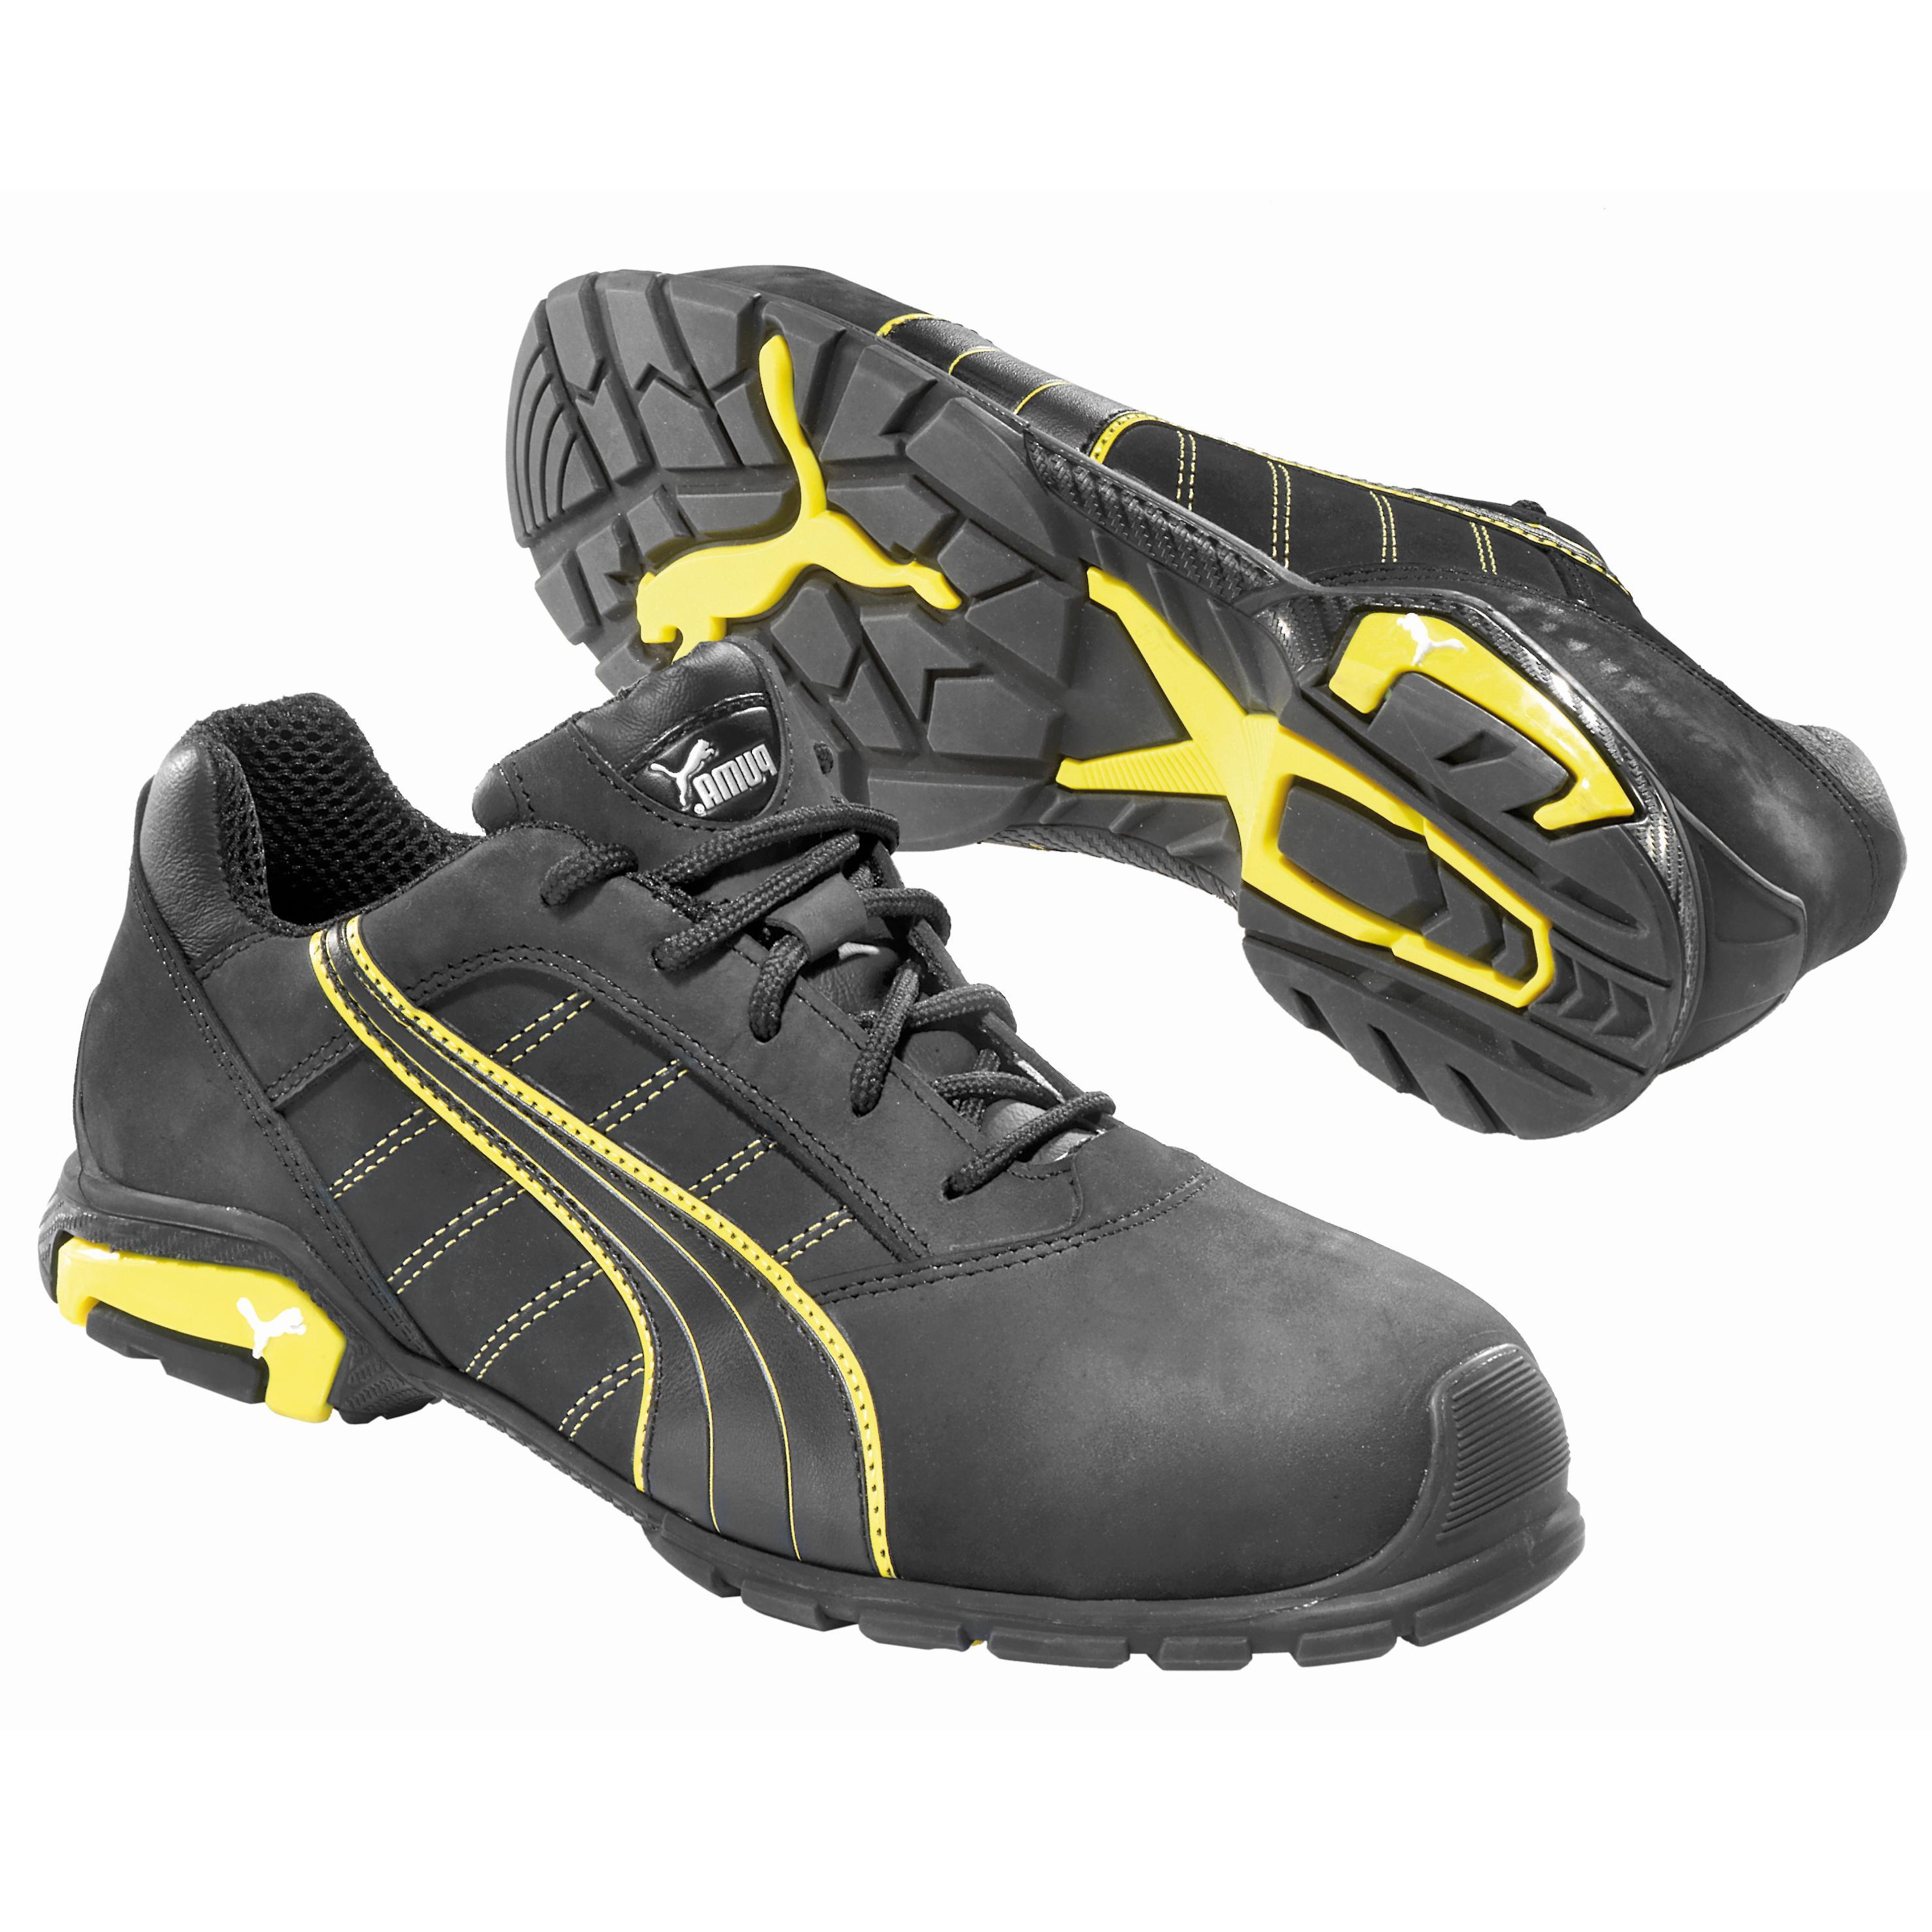 cee20729860bb2 Puma Amsterdam Low Aluminum Toe Static-Dissipative Work Athletic Shoe